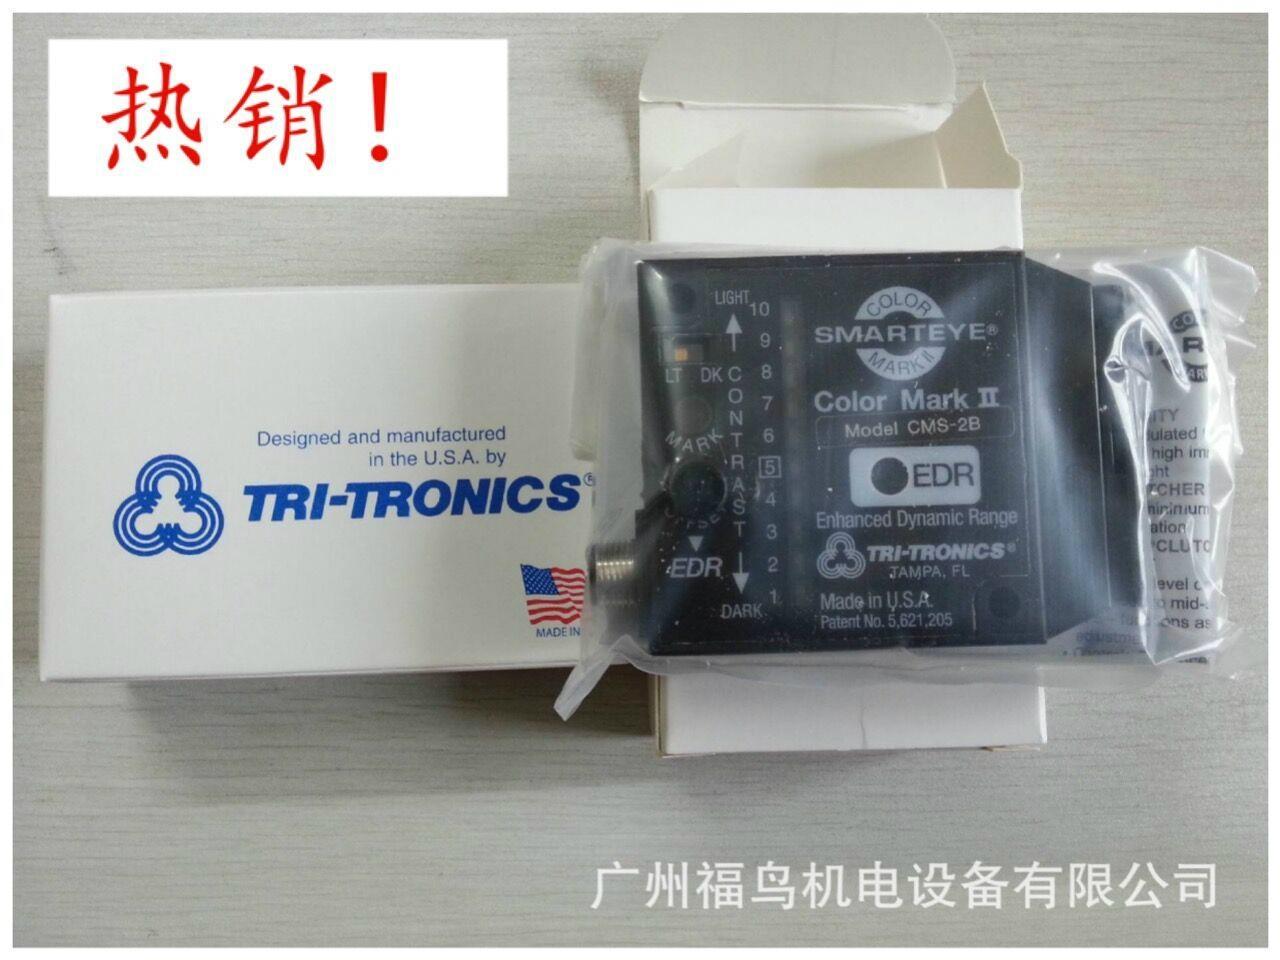 TRI-TRONICS傳感器, 電眼, 型號: CMS-2BF1